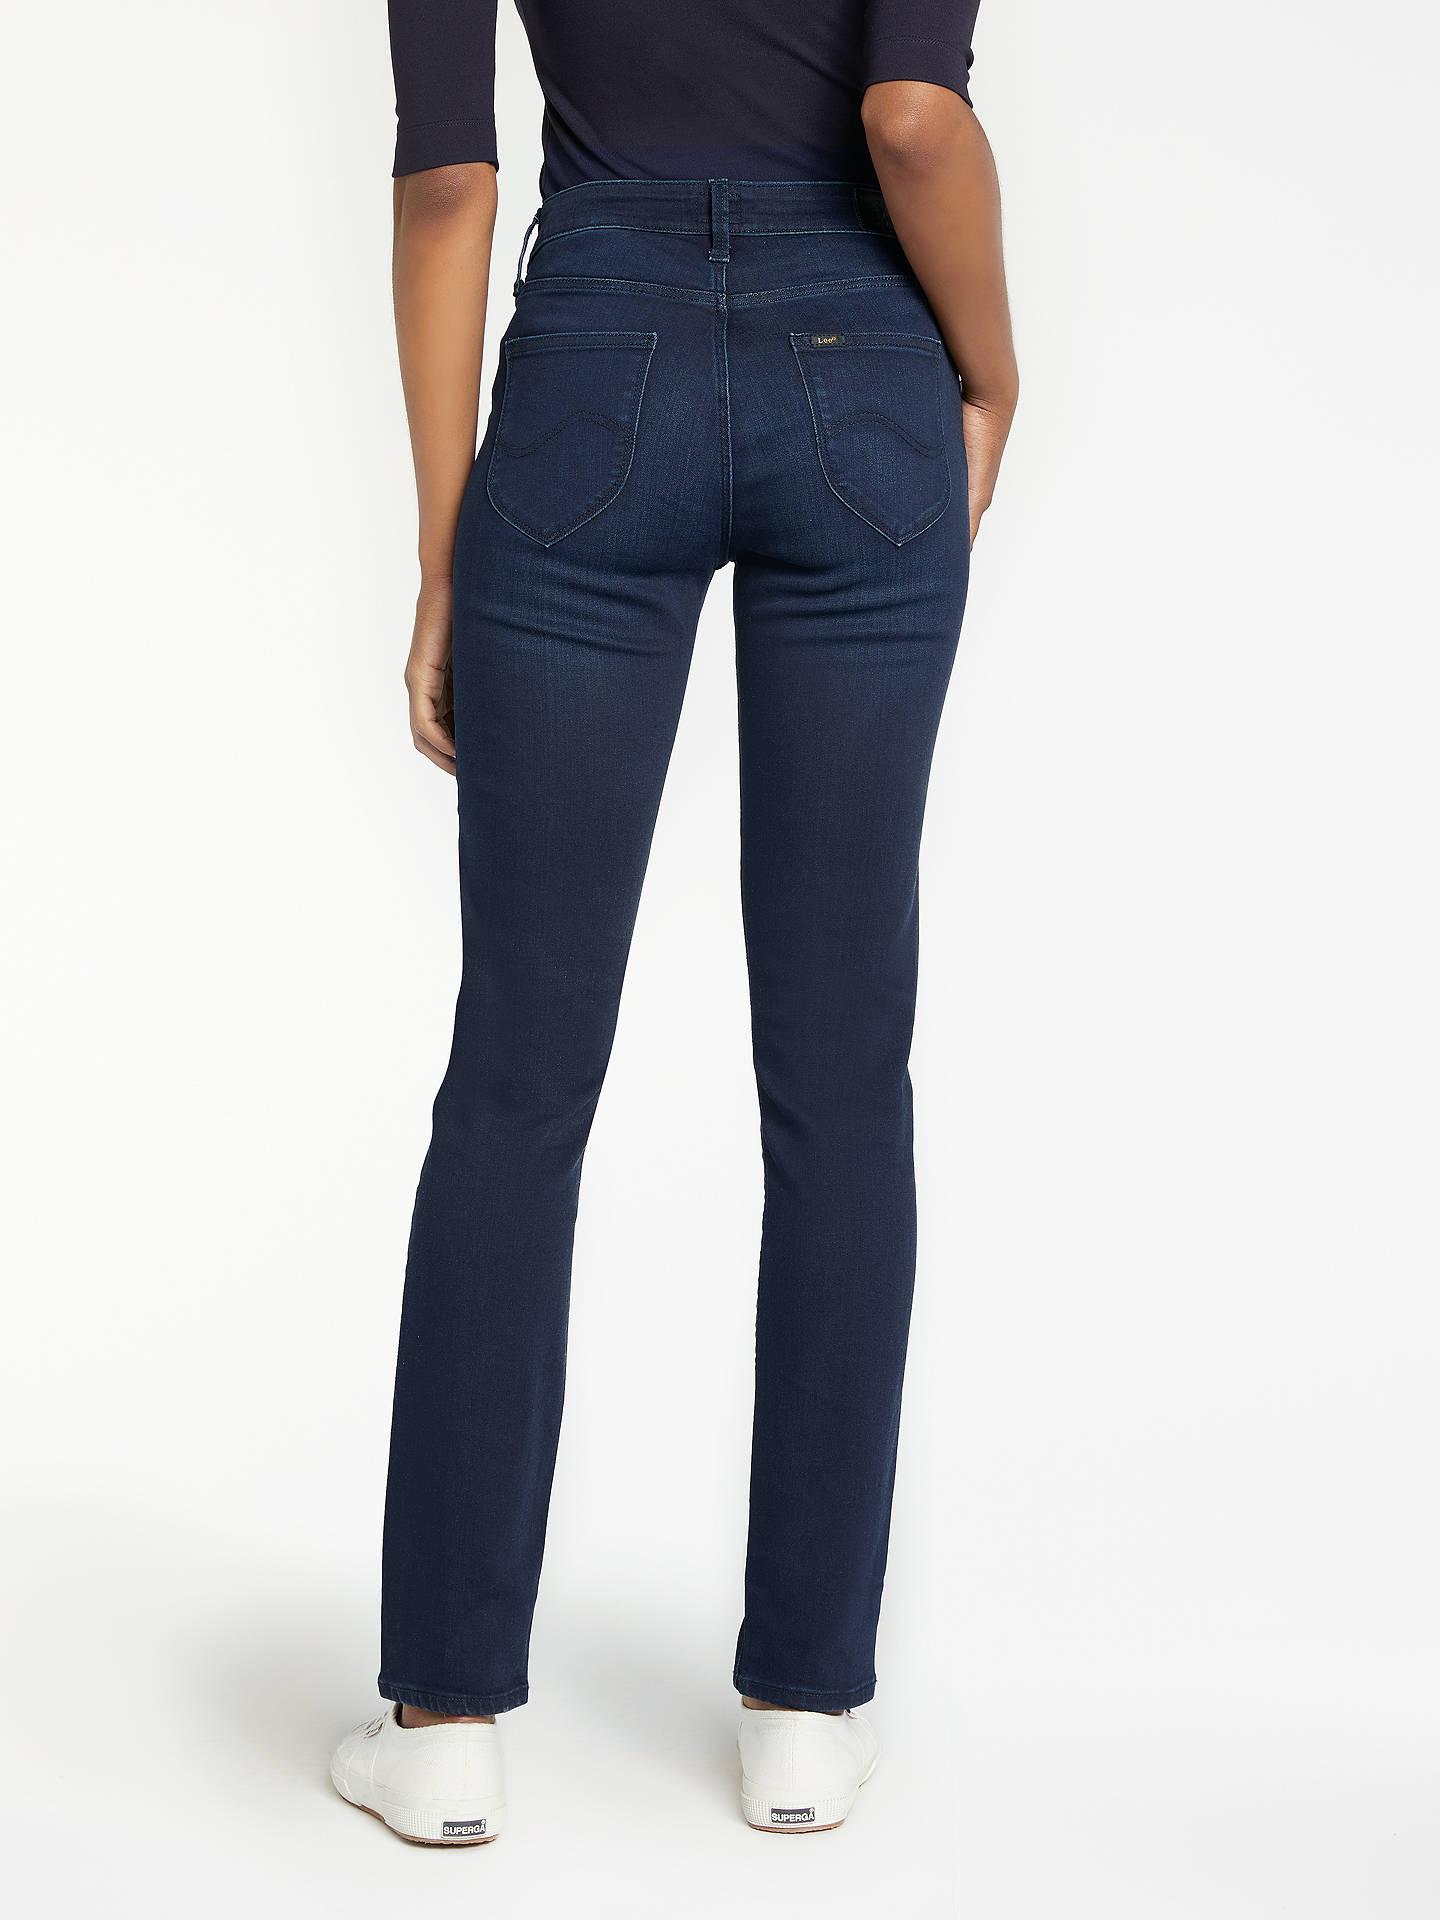 dbe76acf ... Buy Lee Elly High Waist Slim Leg Jeans, Super Dark, W27/L31 Online ...